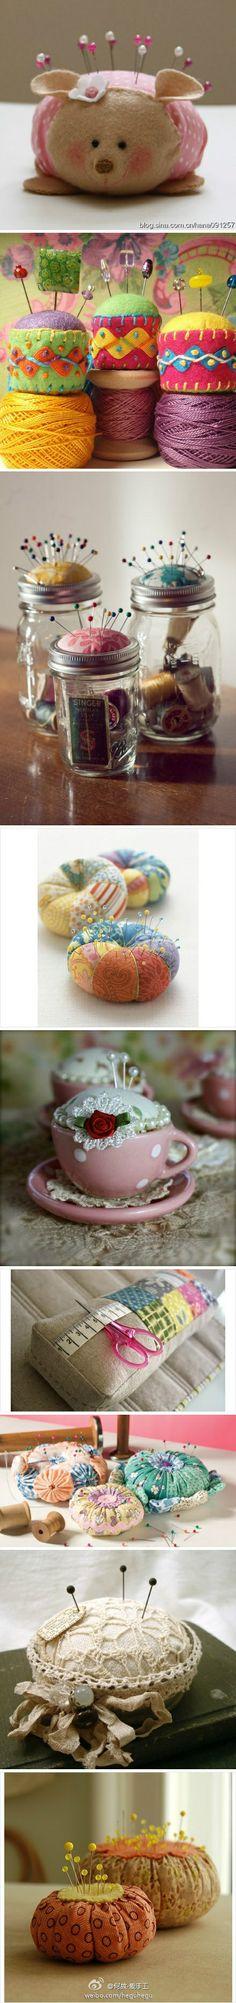 DIY pincushions